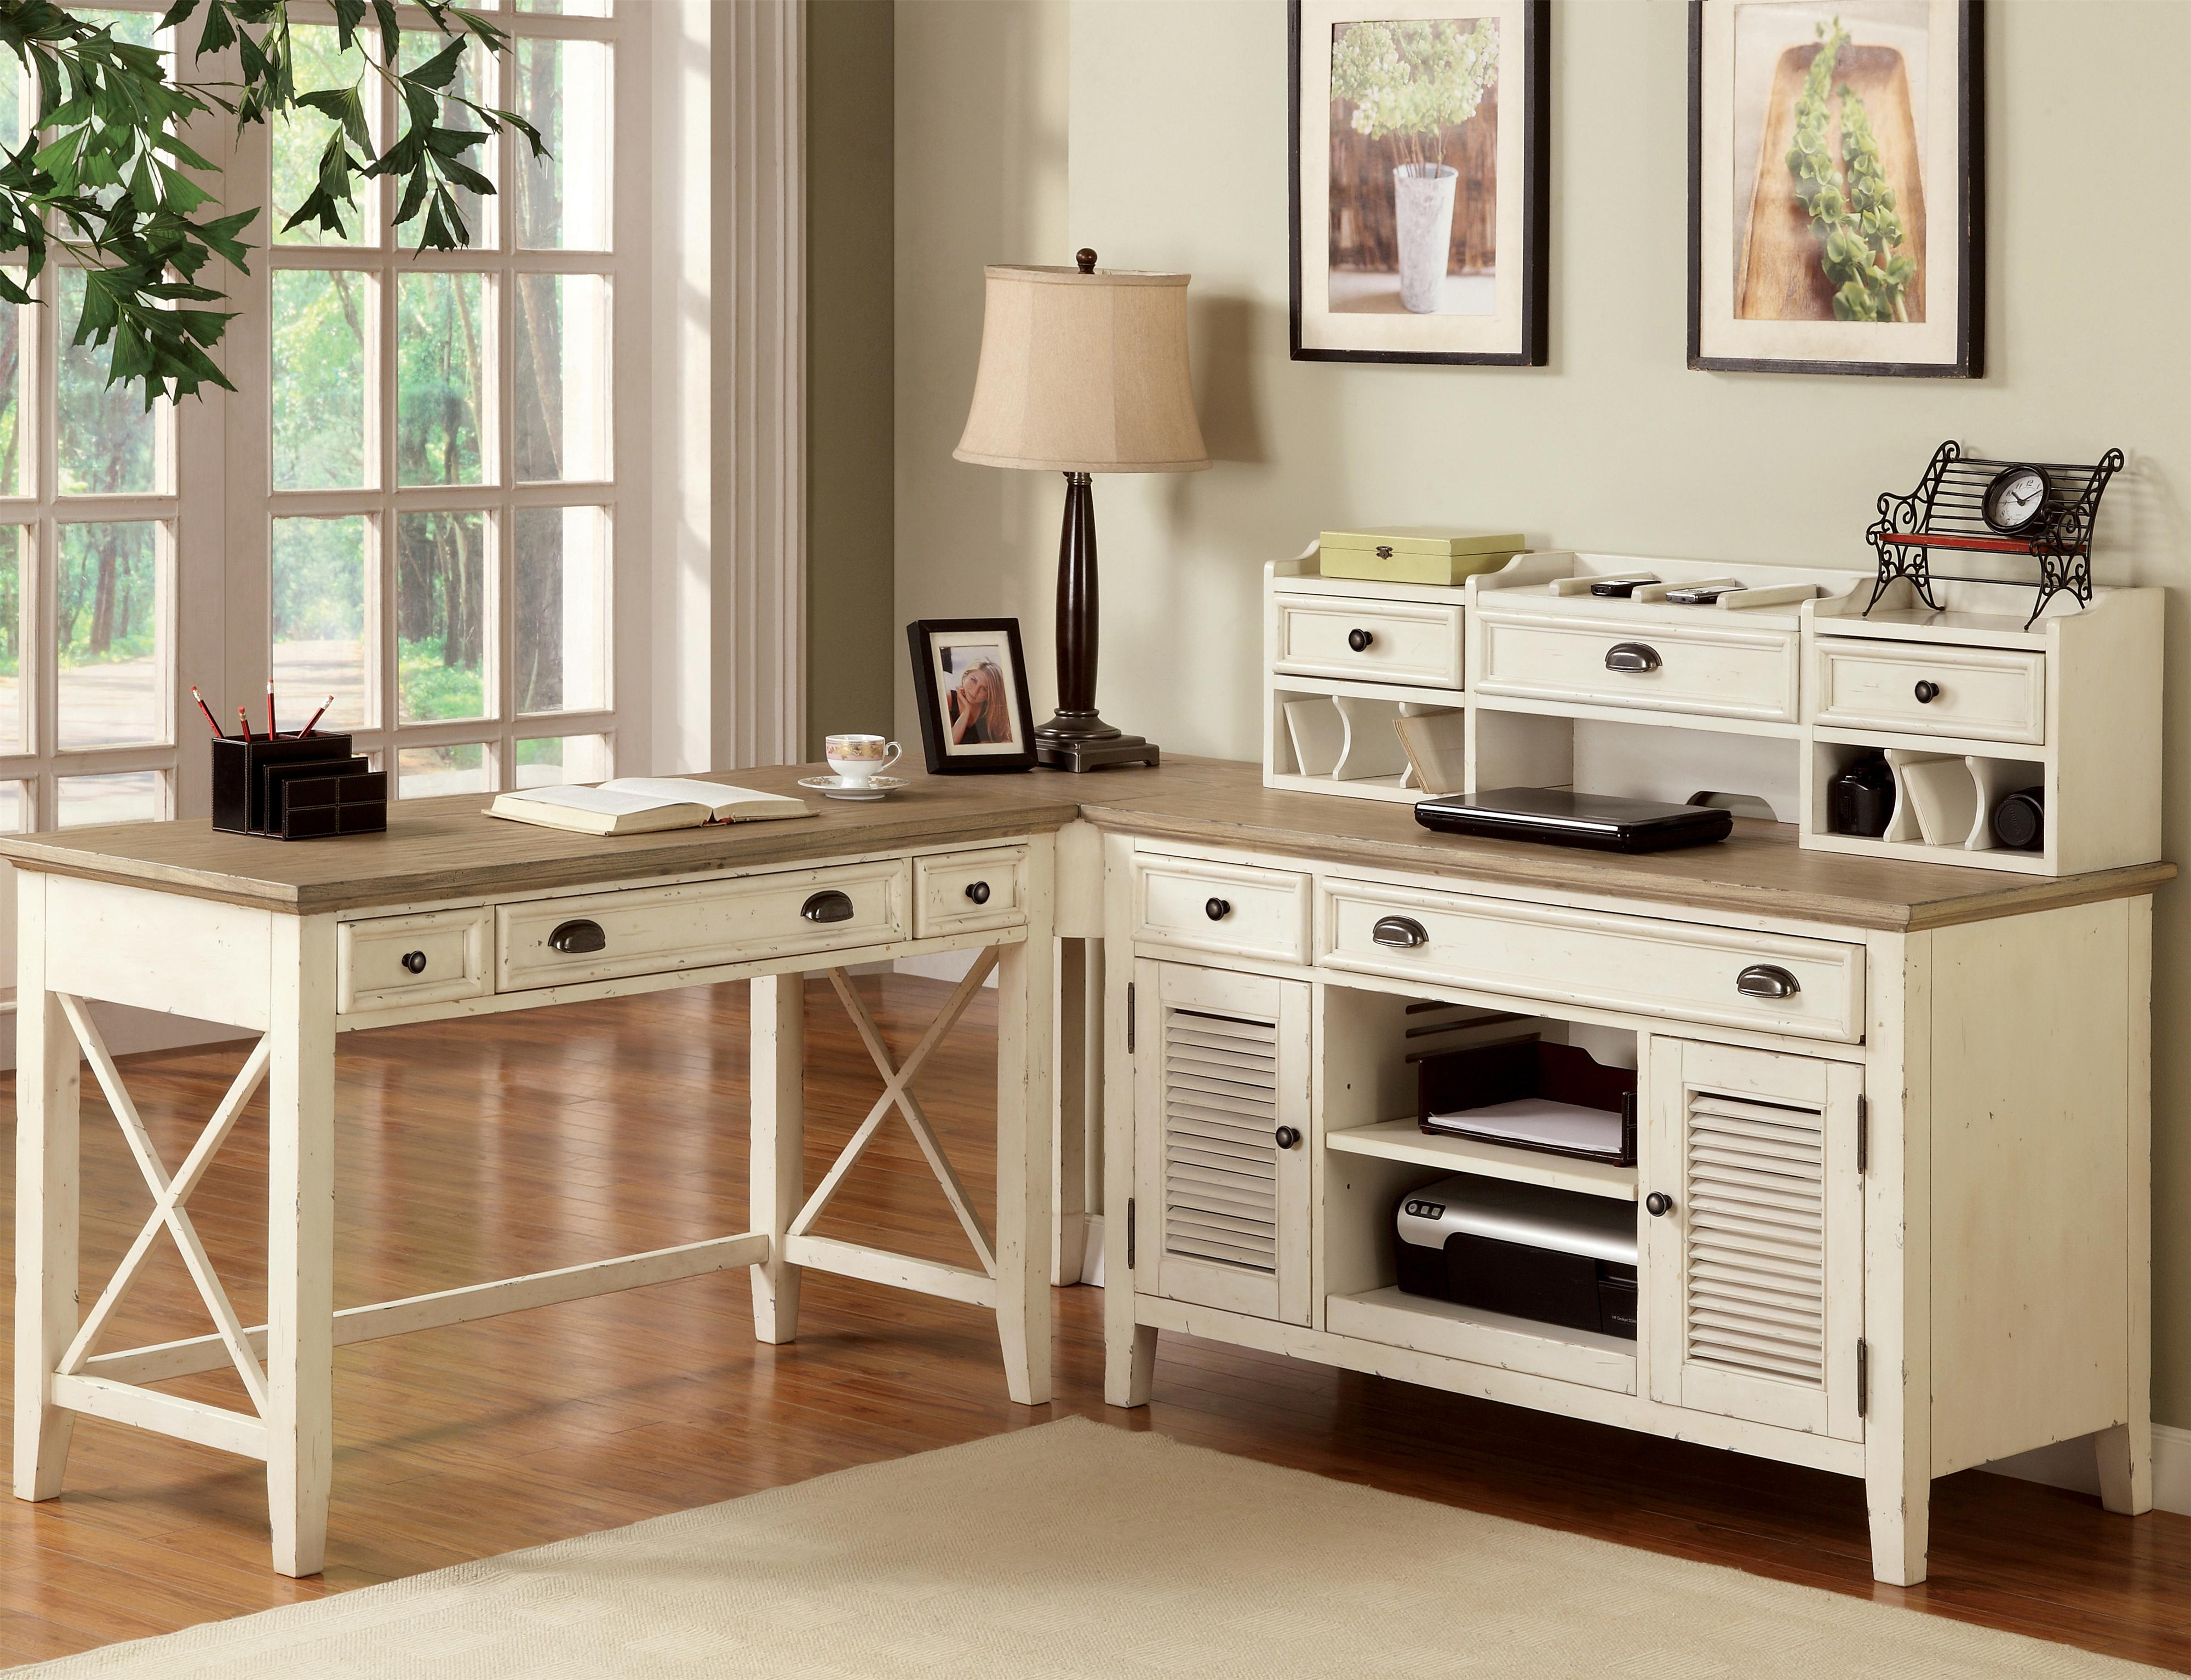 Colored corner desk armoire Doors Credenza Small Hutch Floodoffirecom Shutter Door Credenza Small Hutch By Riverside Furniture Wolf